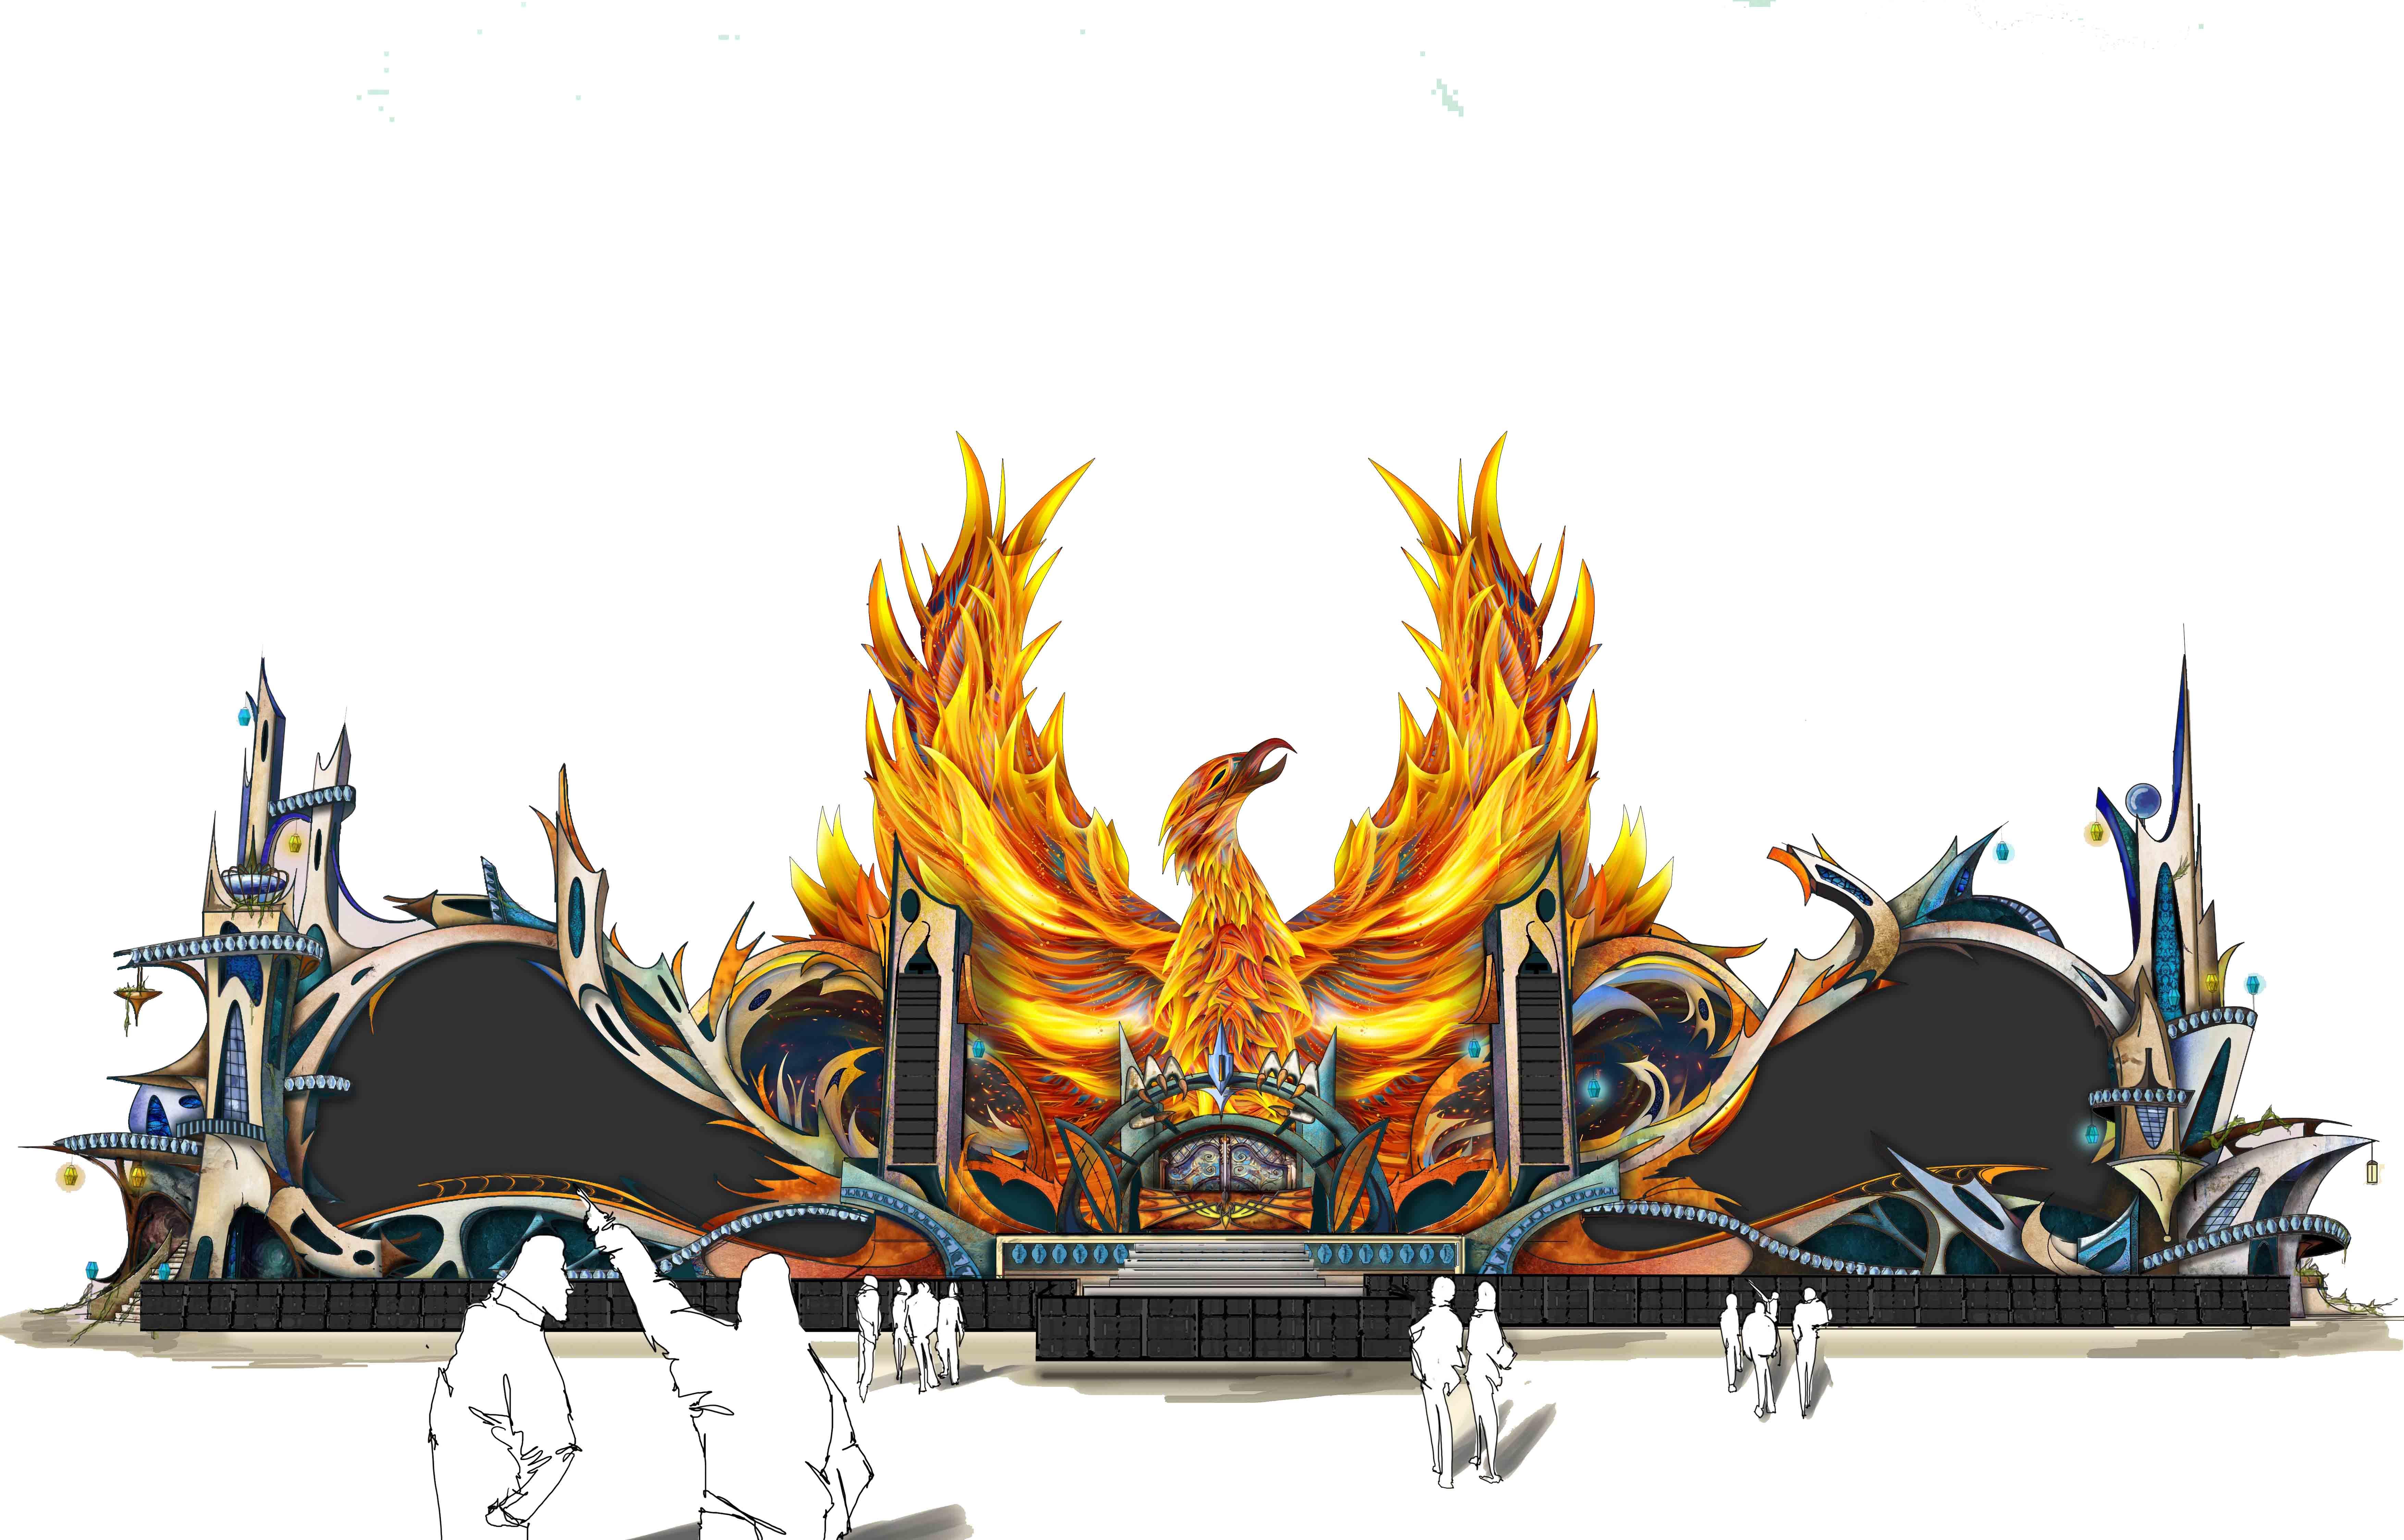 Dreamfields Mexico 2018 - Mainstage design